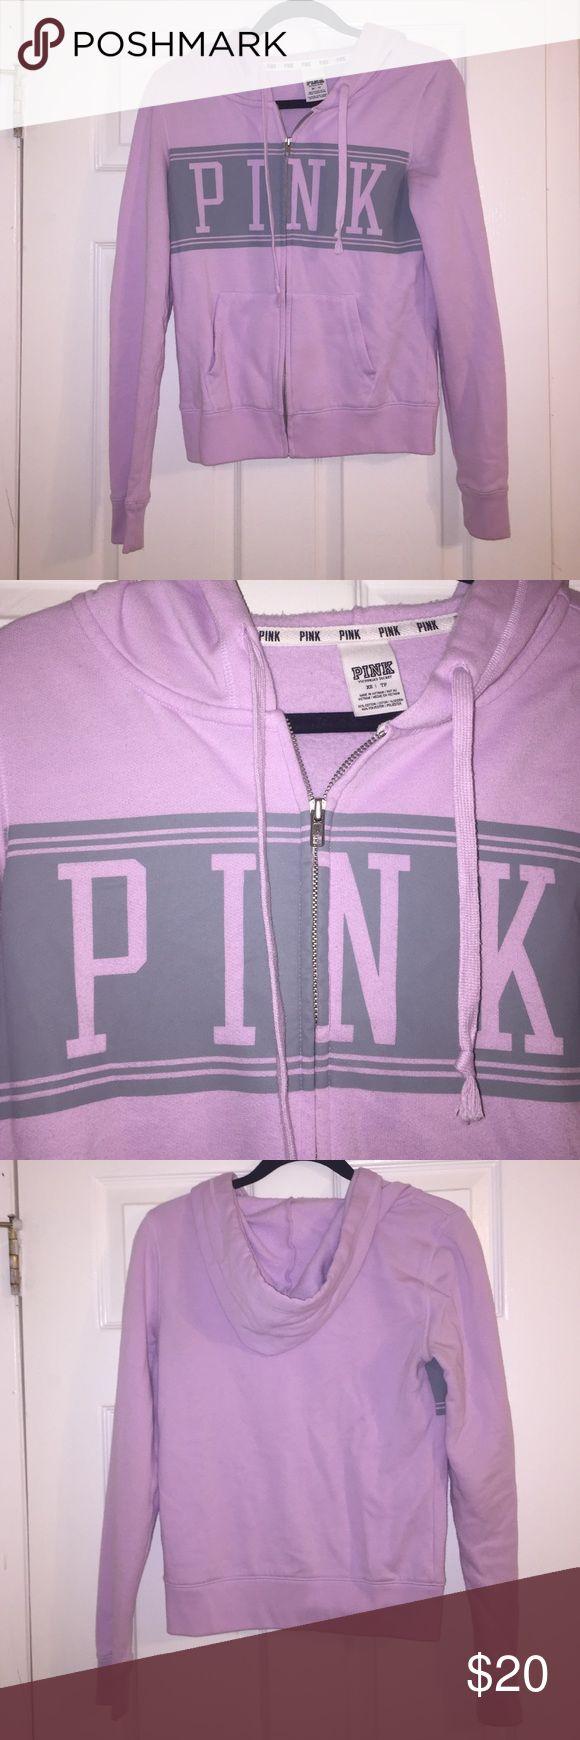 Victoria's Secret PINK Zip-Up Victoria's Secret PINK Zip-Up Hoodie. Lavender color. Make an offer 😊 PINK Victoria's Secret Tops Sweatshirts & Hoodies